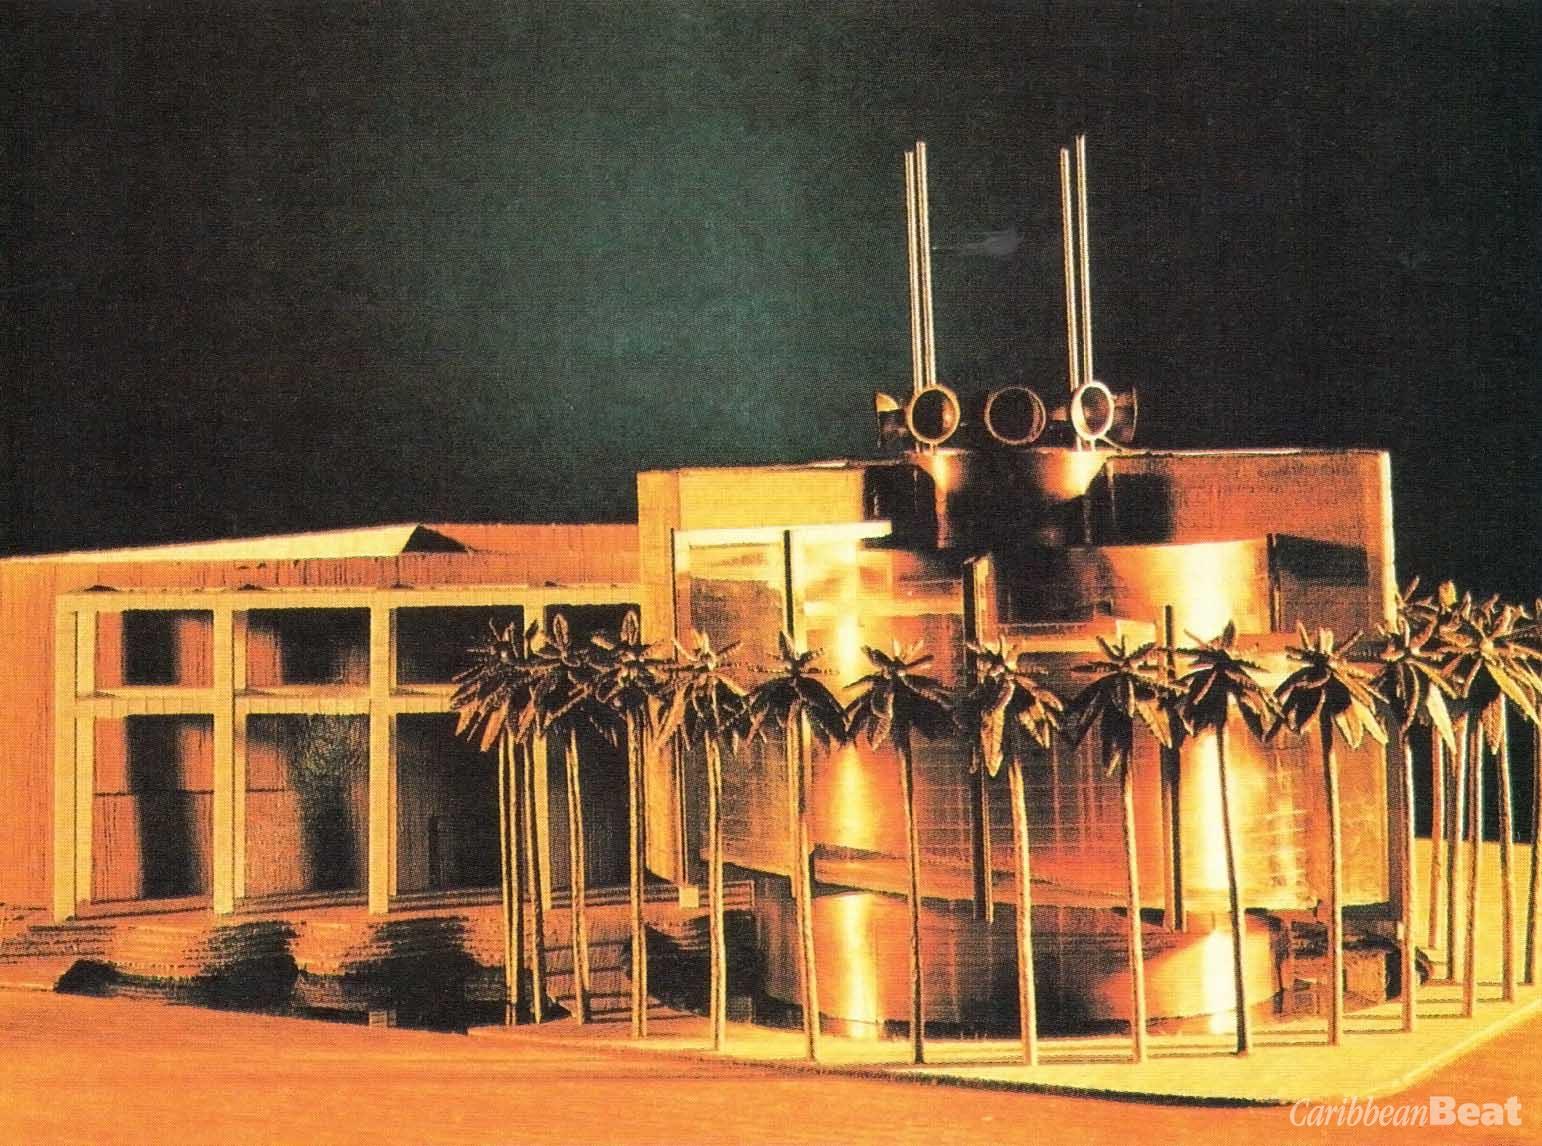 Puerto Rican pavilion (model)